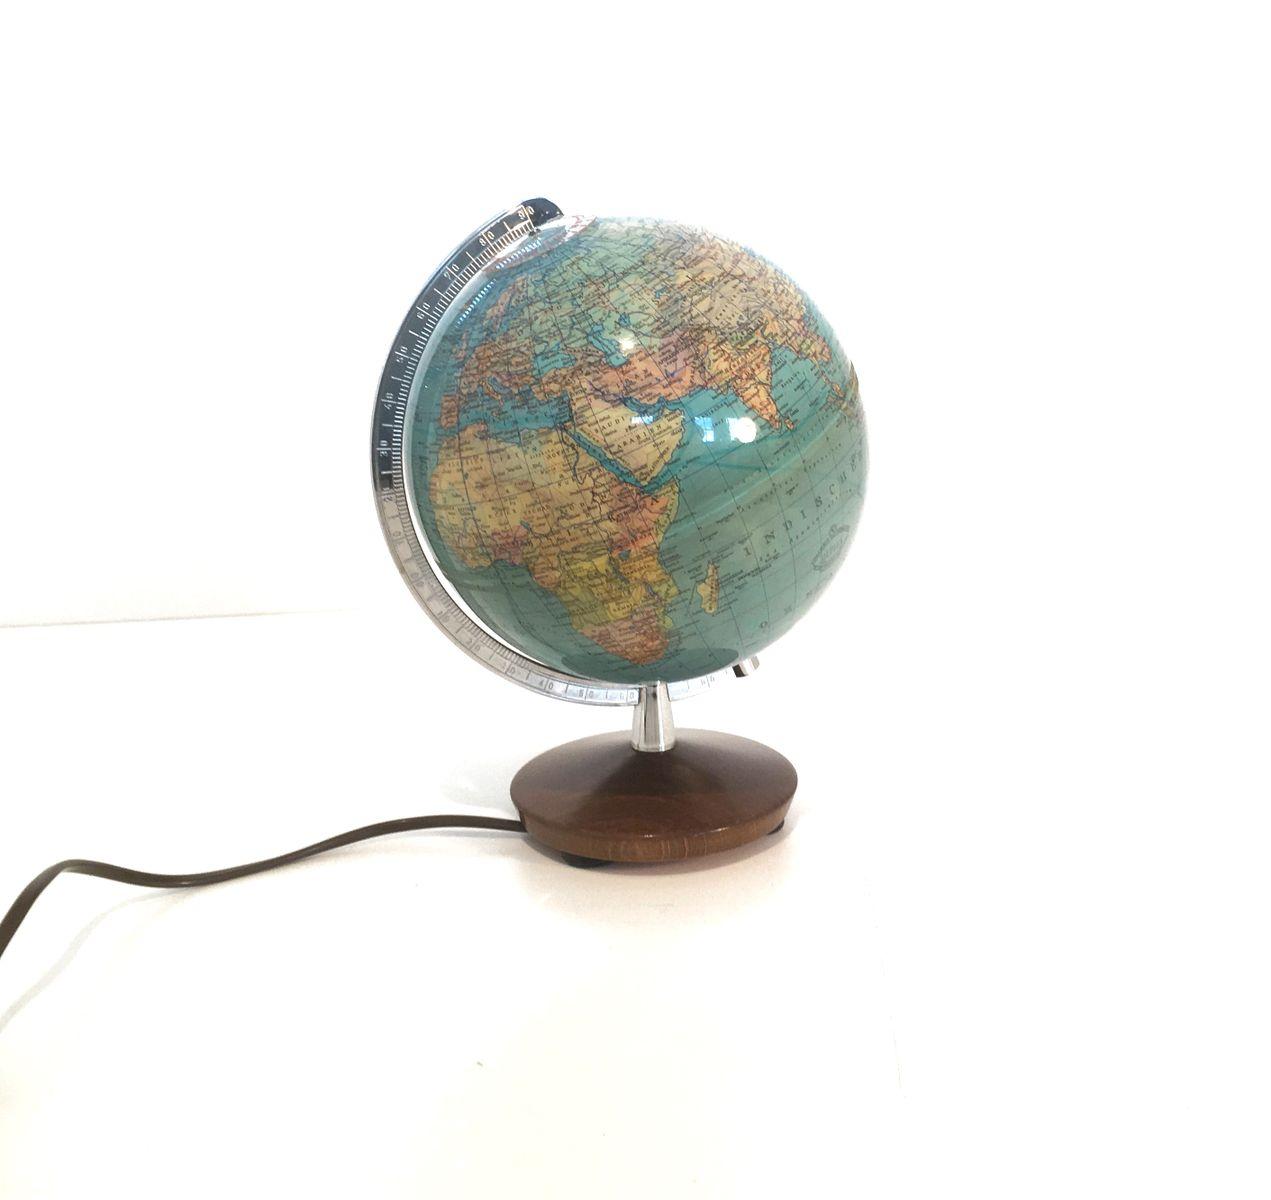 Ekstra Vintage Globus Lampe von Columbus bei Pamono kaufen IB26